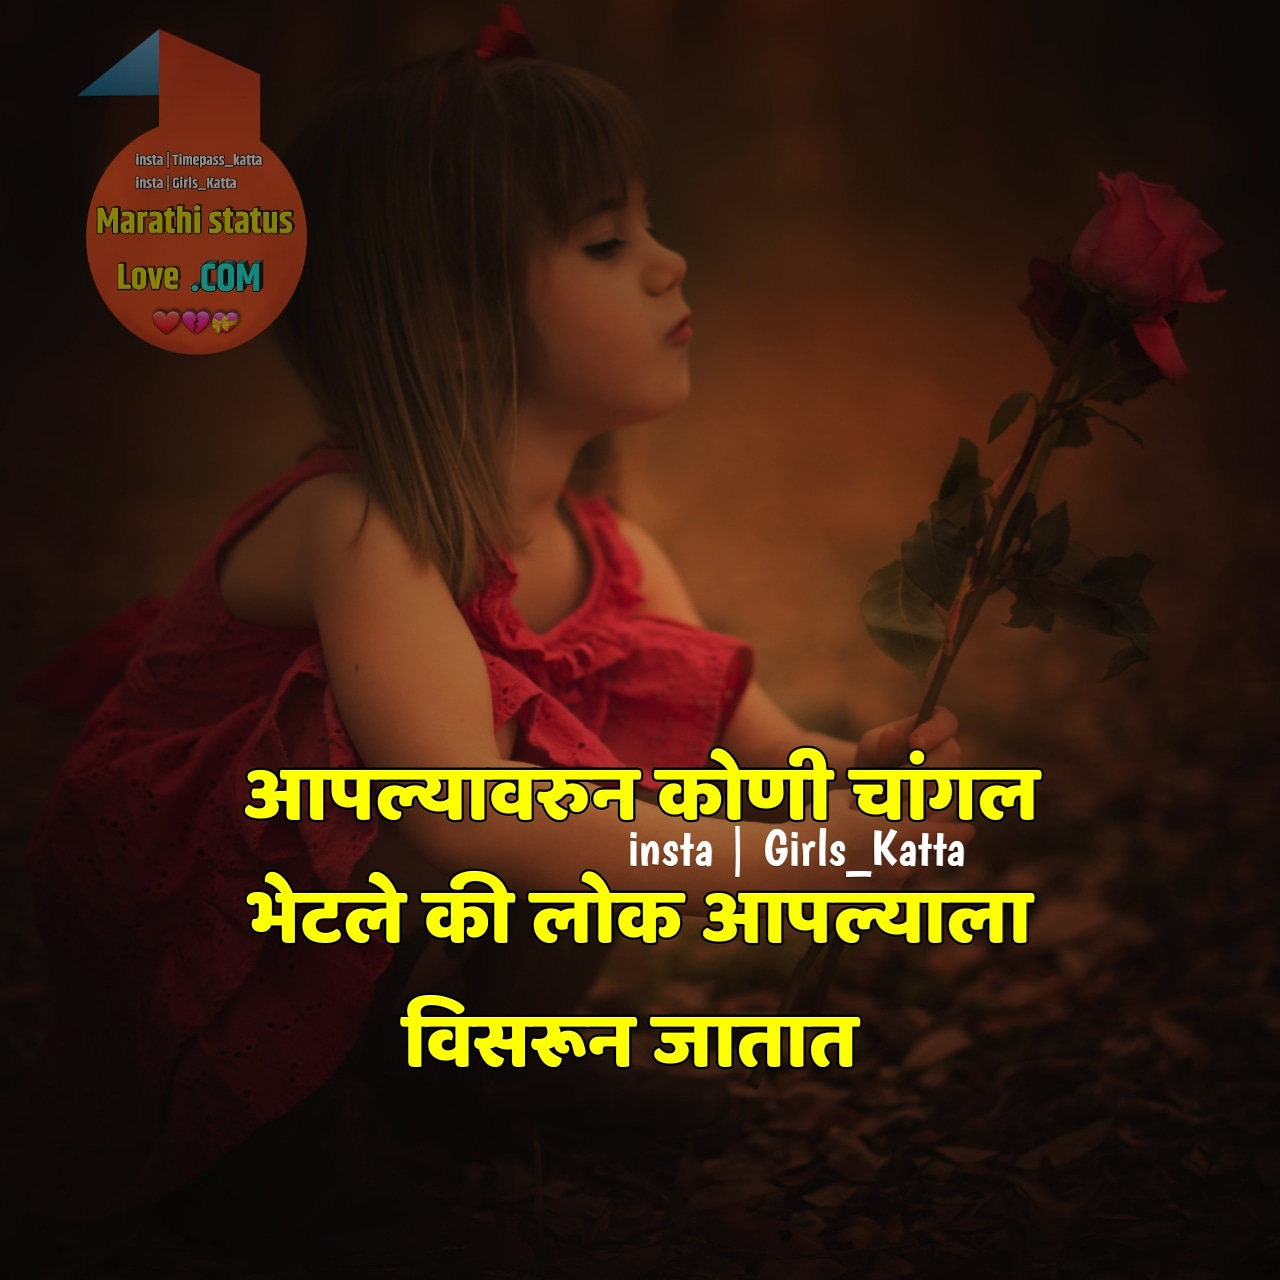 Marathi girls status ~ Marathi love status | मराठी स्टेटस